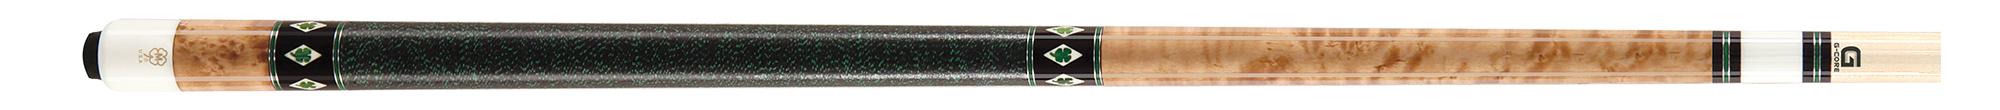 PK3070: McDermott M72A Birdseye/inlay pool #1